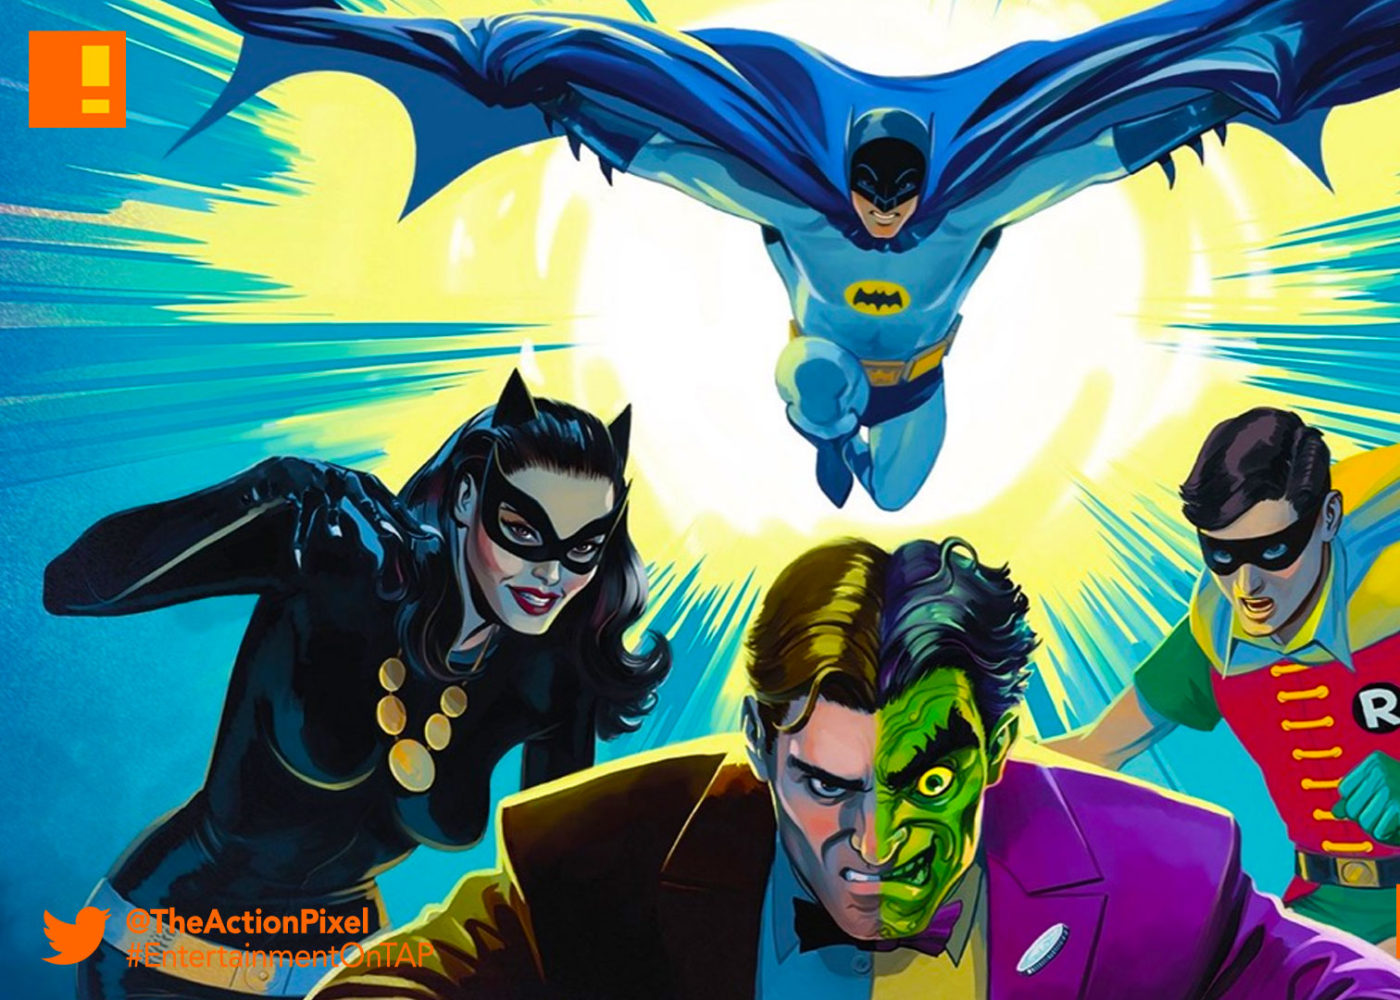 batman vs two-face, animation, wb animation, dvd, bluray, adam west, william shatner, the action pixel, entertainment on tap,dc comics, dc entertainment ,